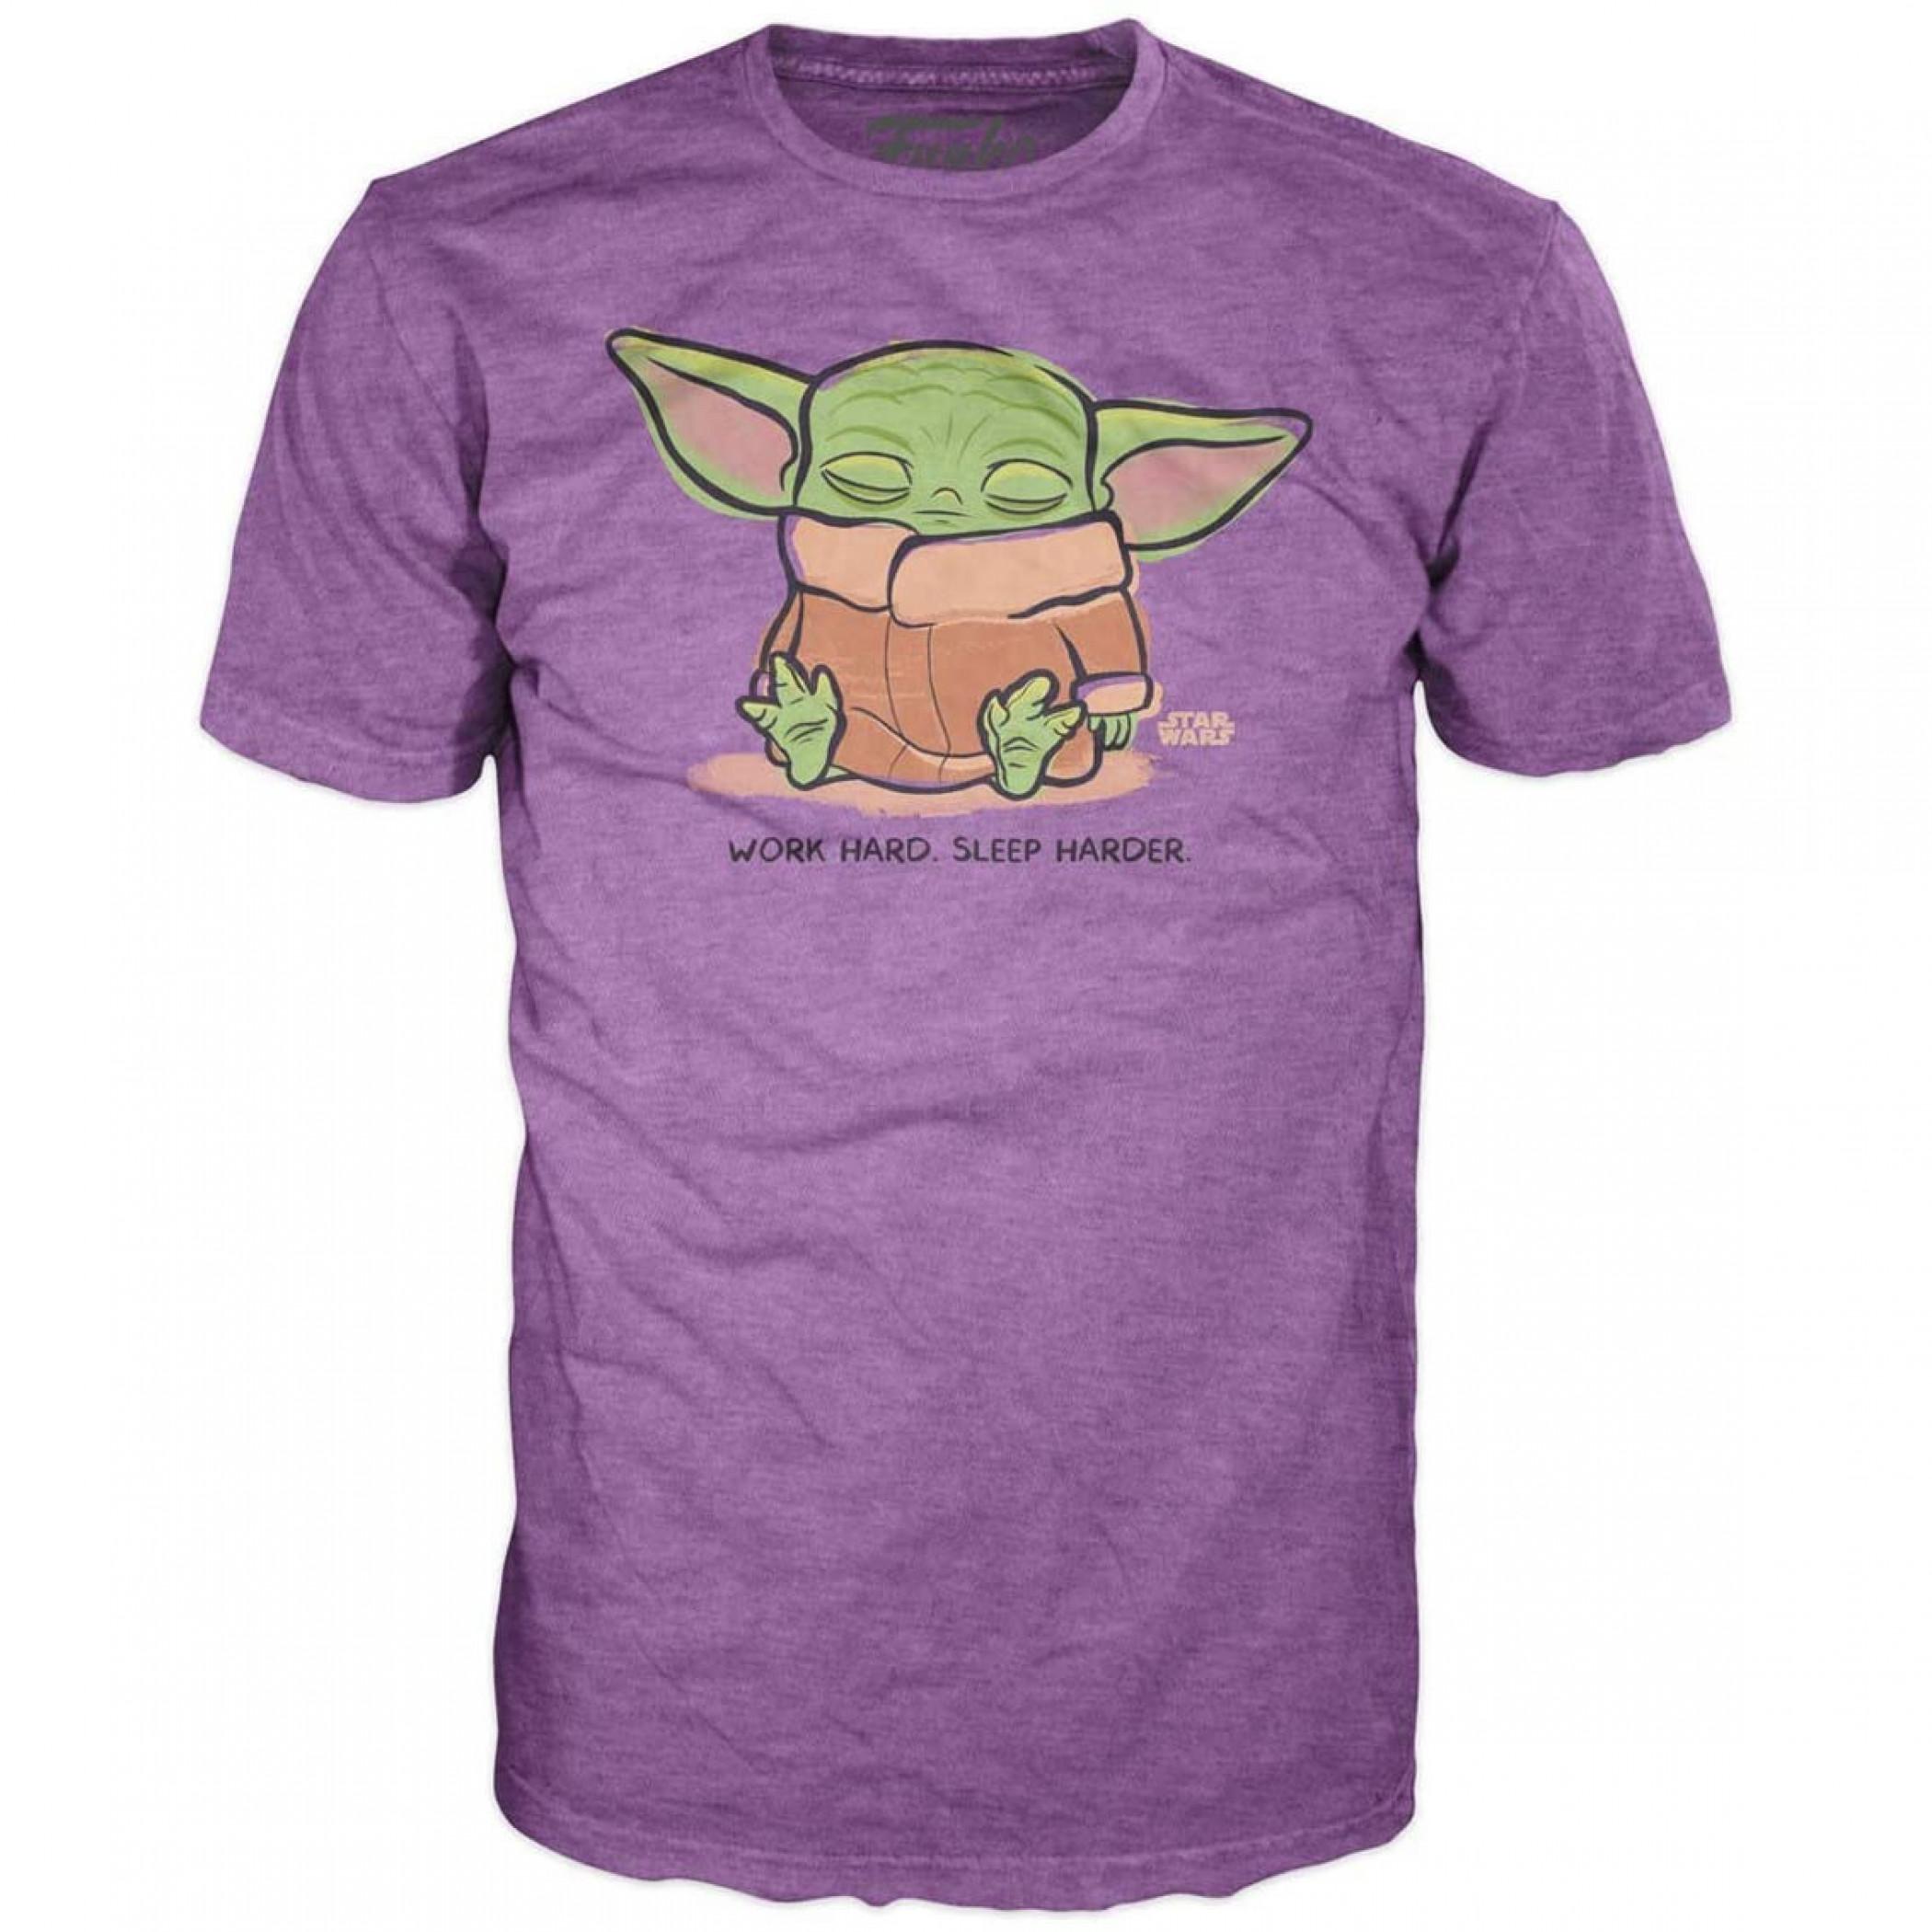 Star Wars The Mandalorian The Child Work Hard Sleep Harder T-Shirt